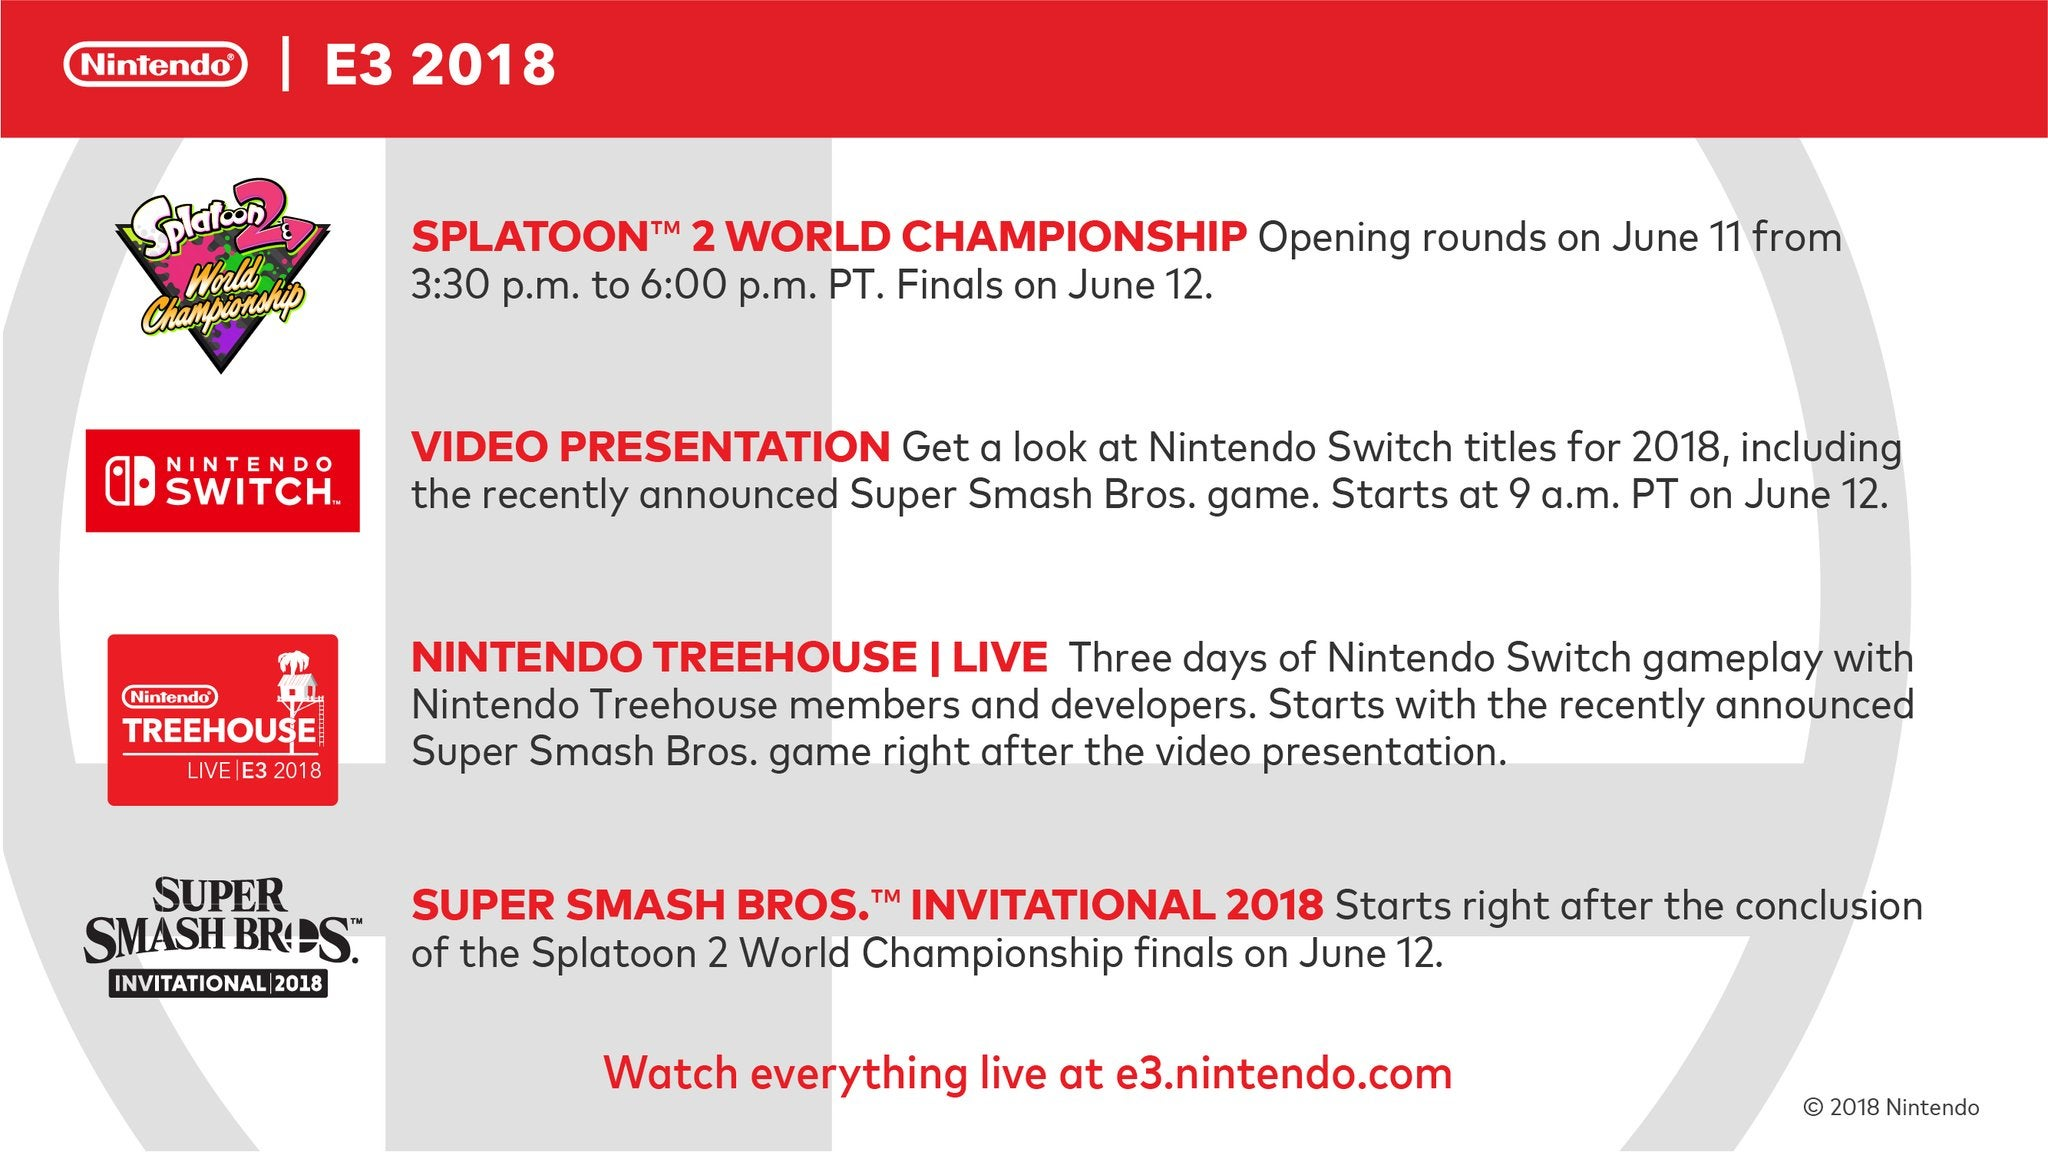 Nintendo's E3 2018 Schedule